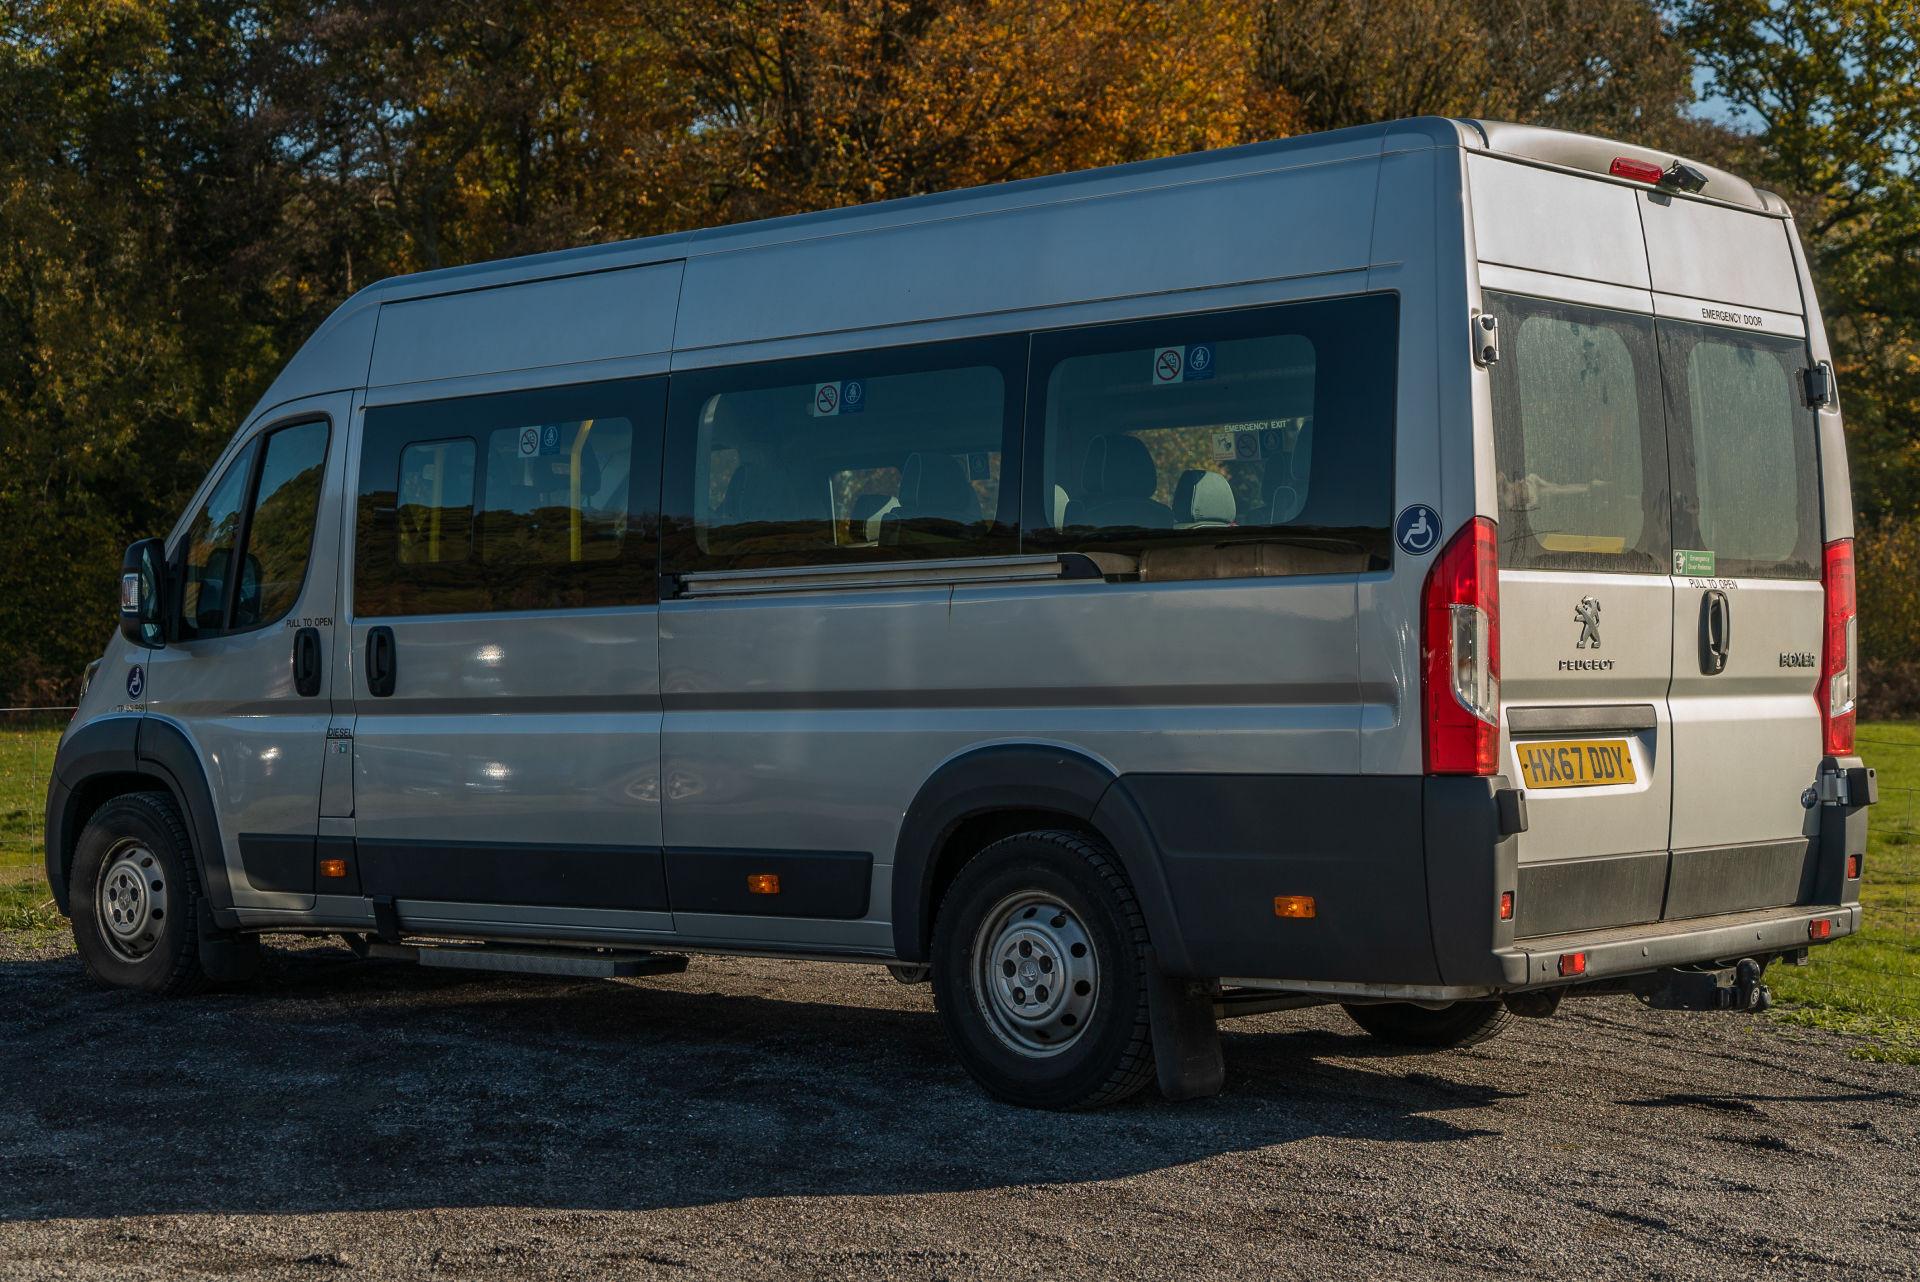 Peugeot Boxer 17 Seater Accessible Minibus for Sale - Image 3